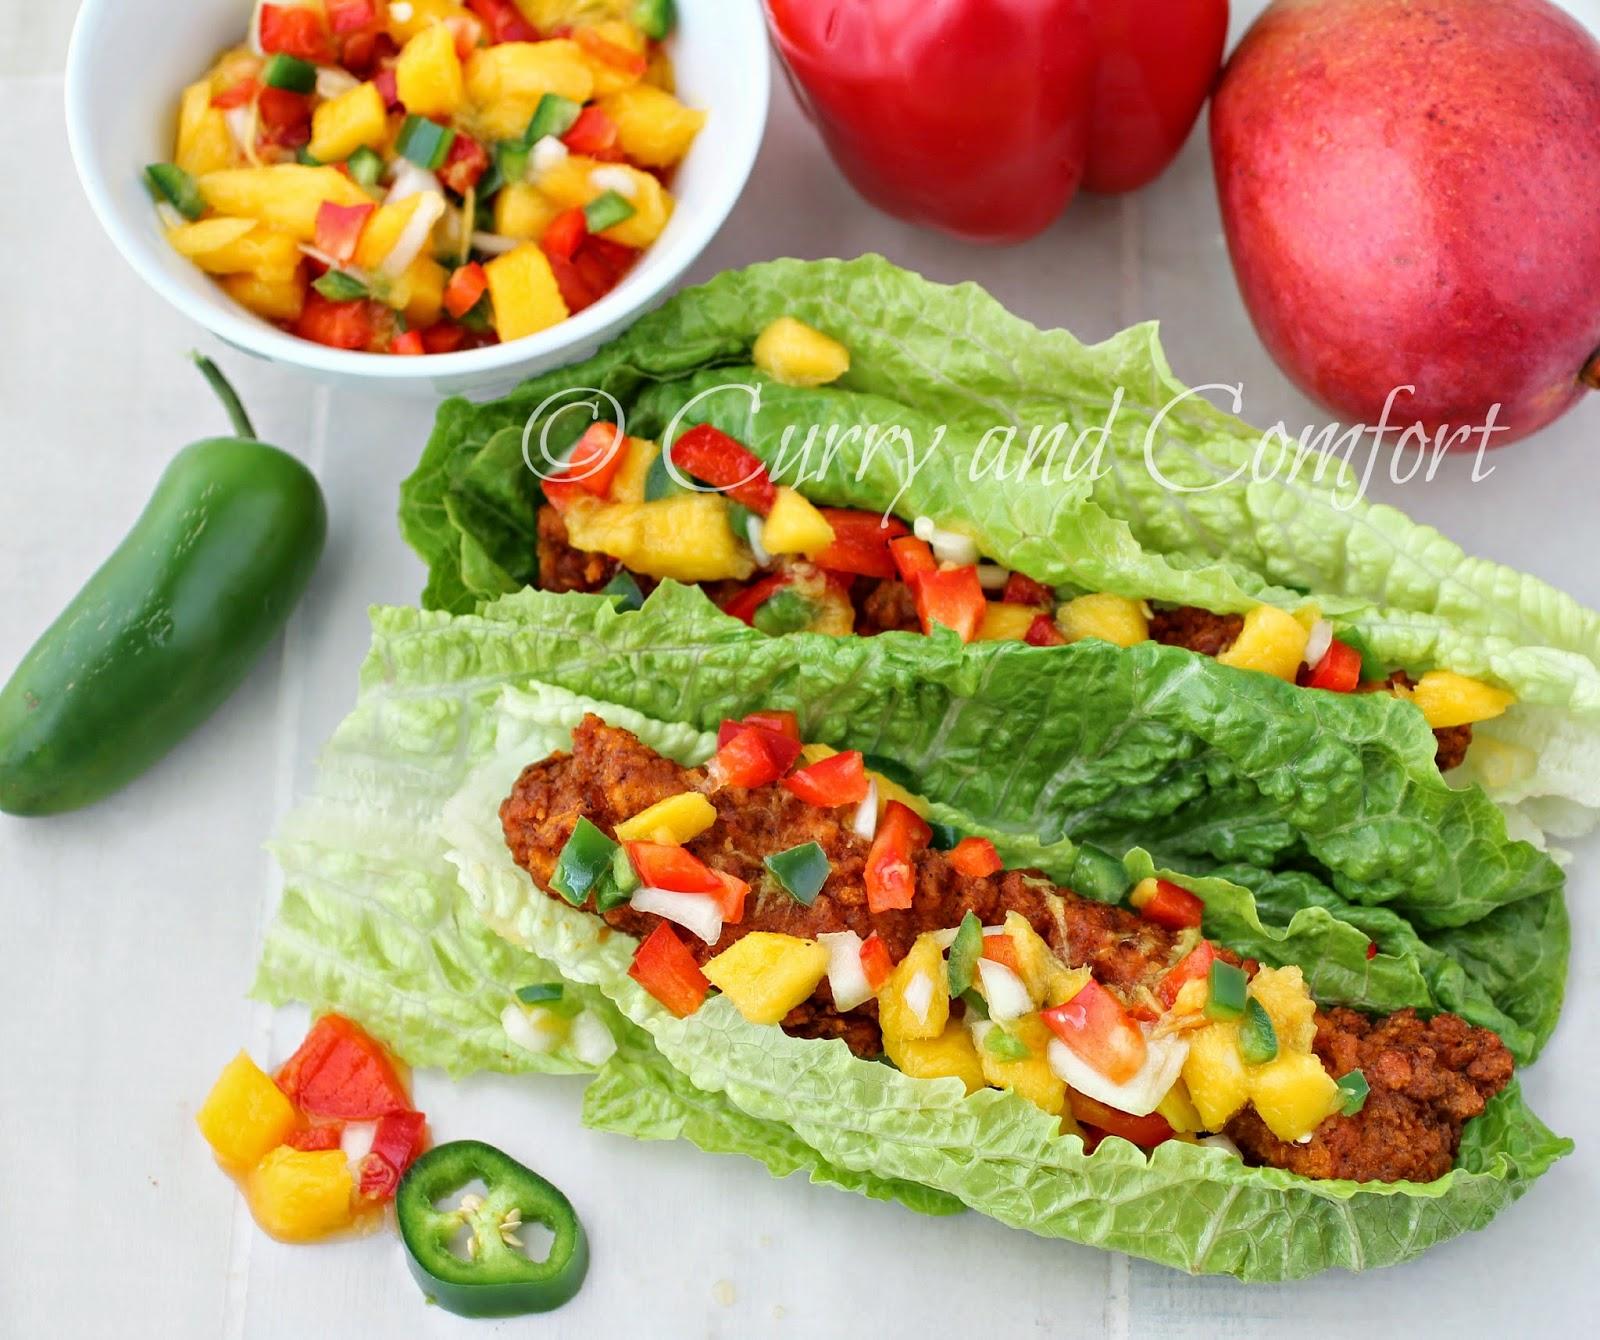 Kitchen Simmer: Buffalo Chicken Lettuce Wraps with Mango Salsa